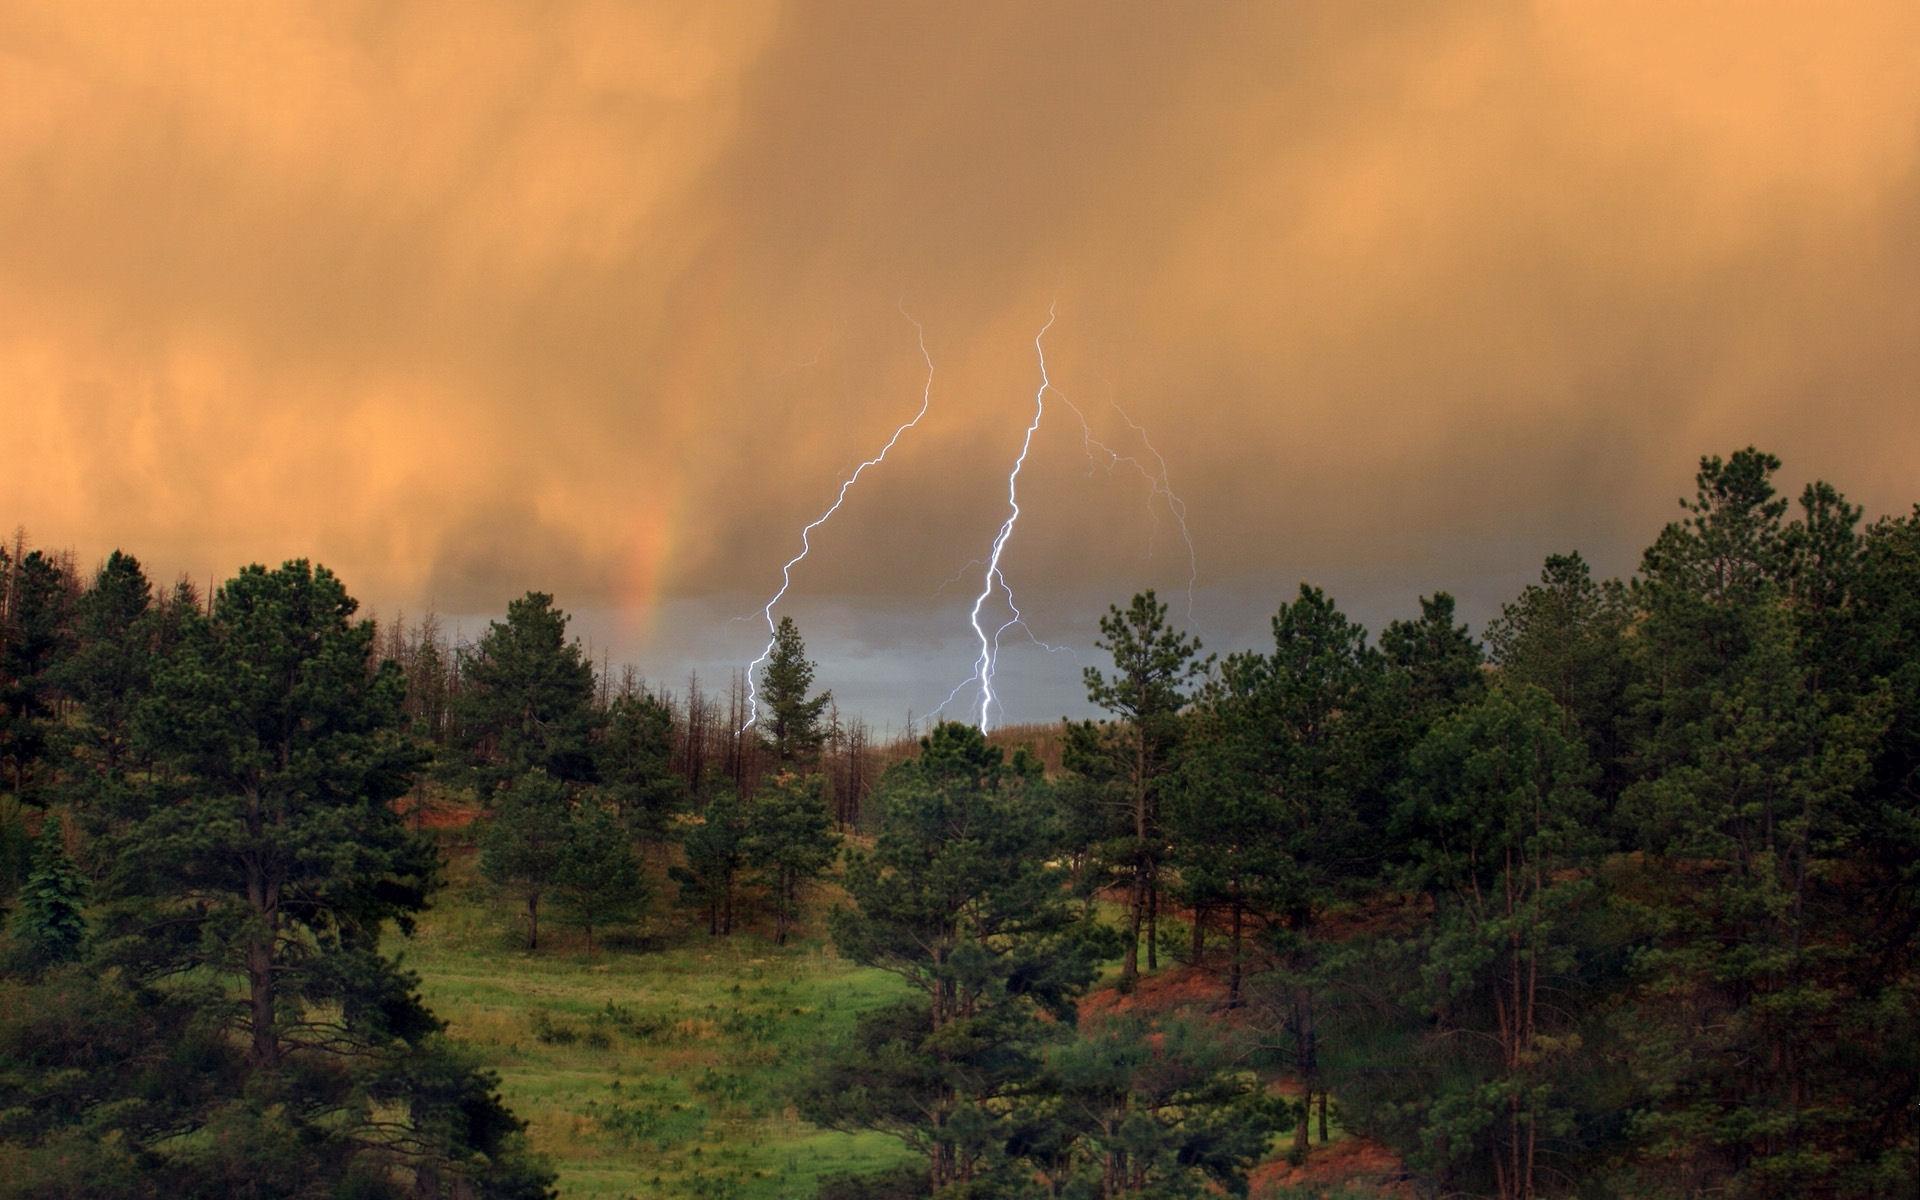 Download - Cloud Rain Lightning , HD Wallpaper & Backgrounds